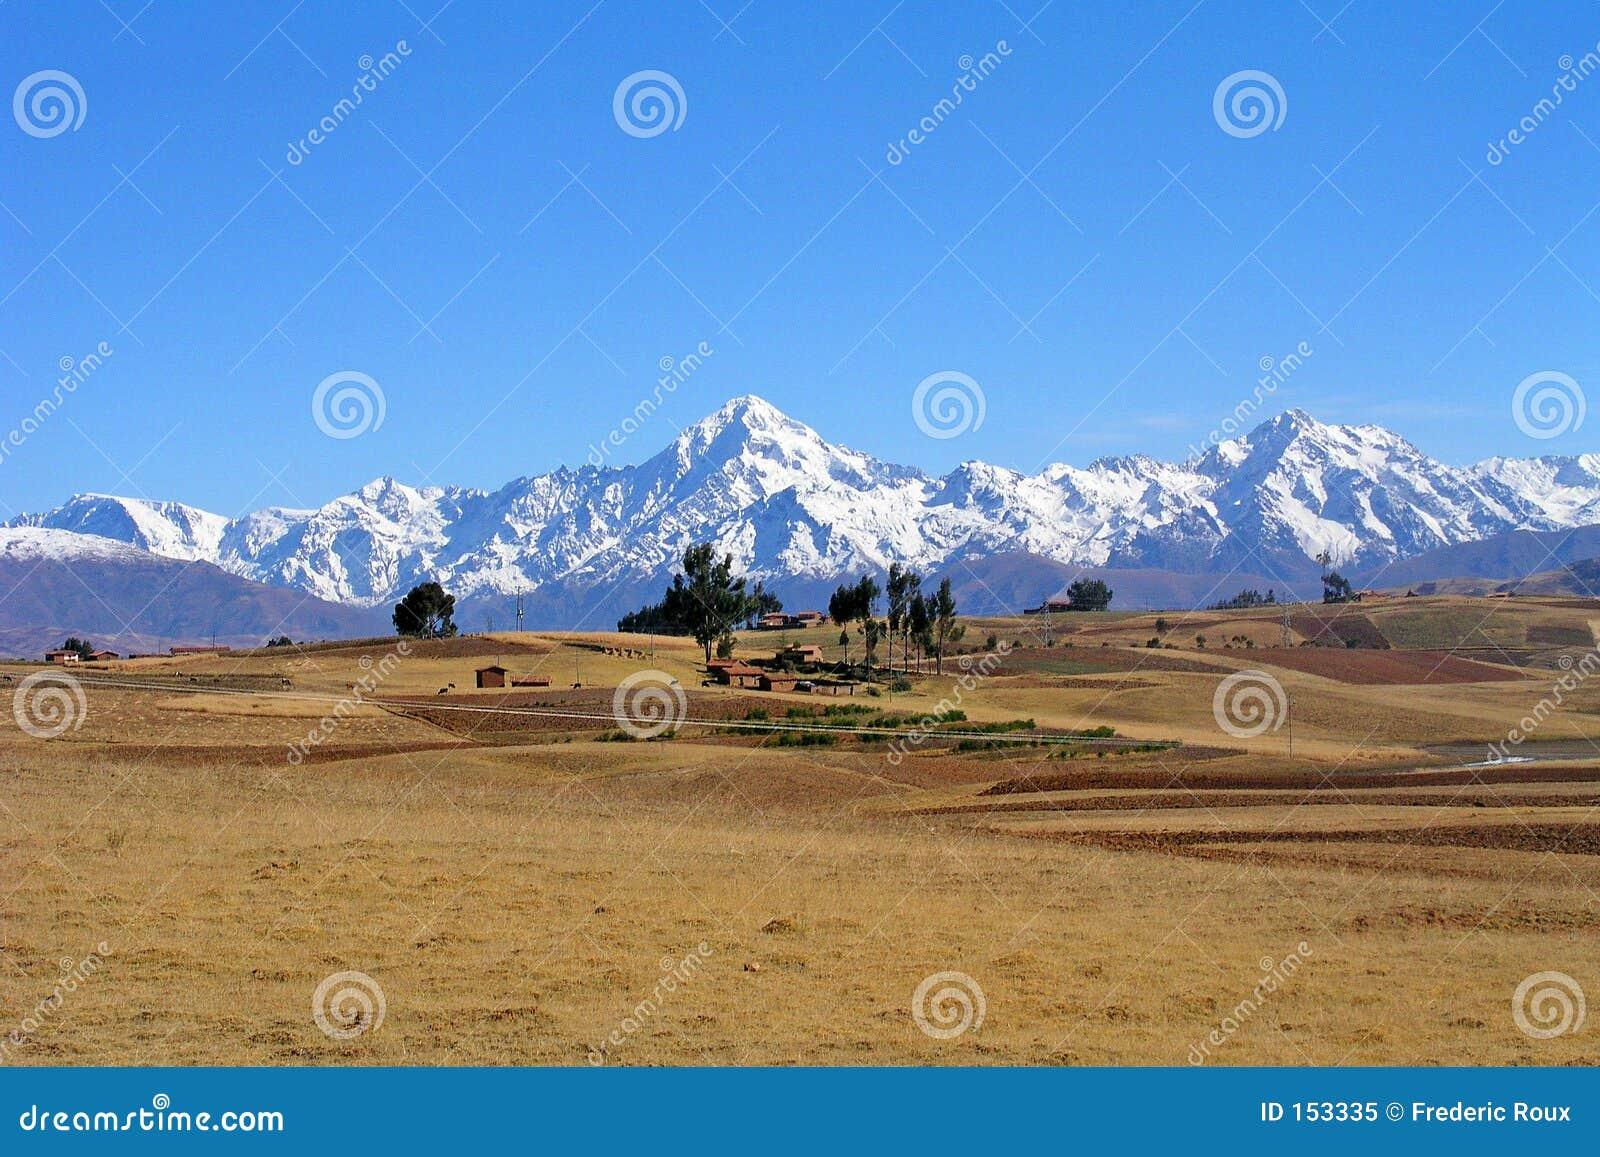 Field of the Altiplano, Bolivia